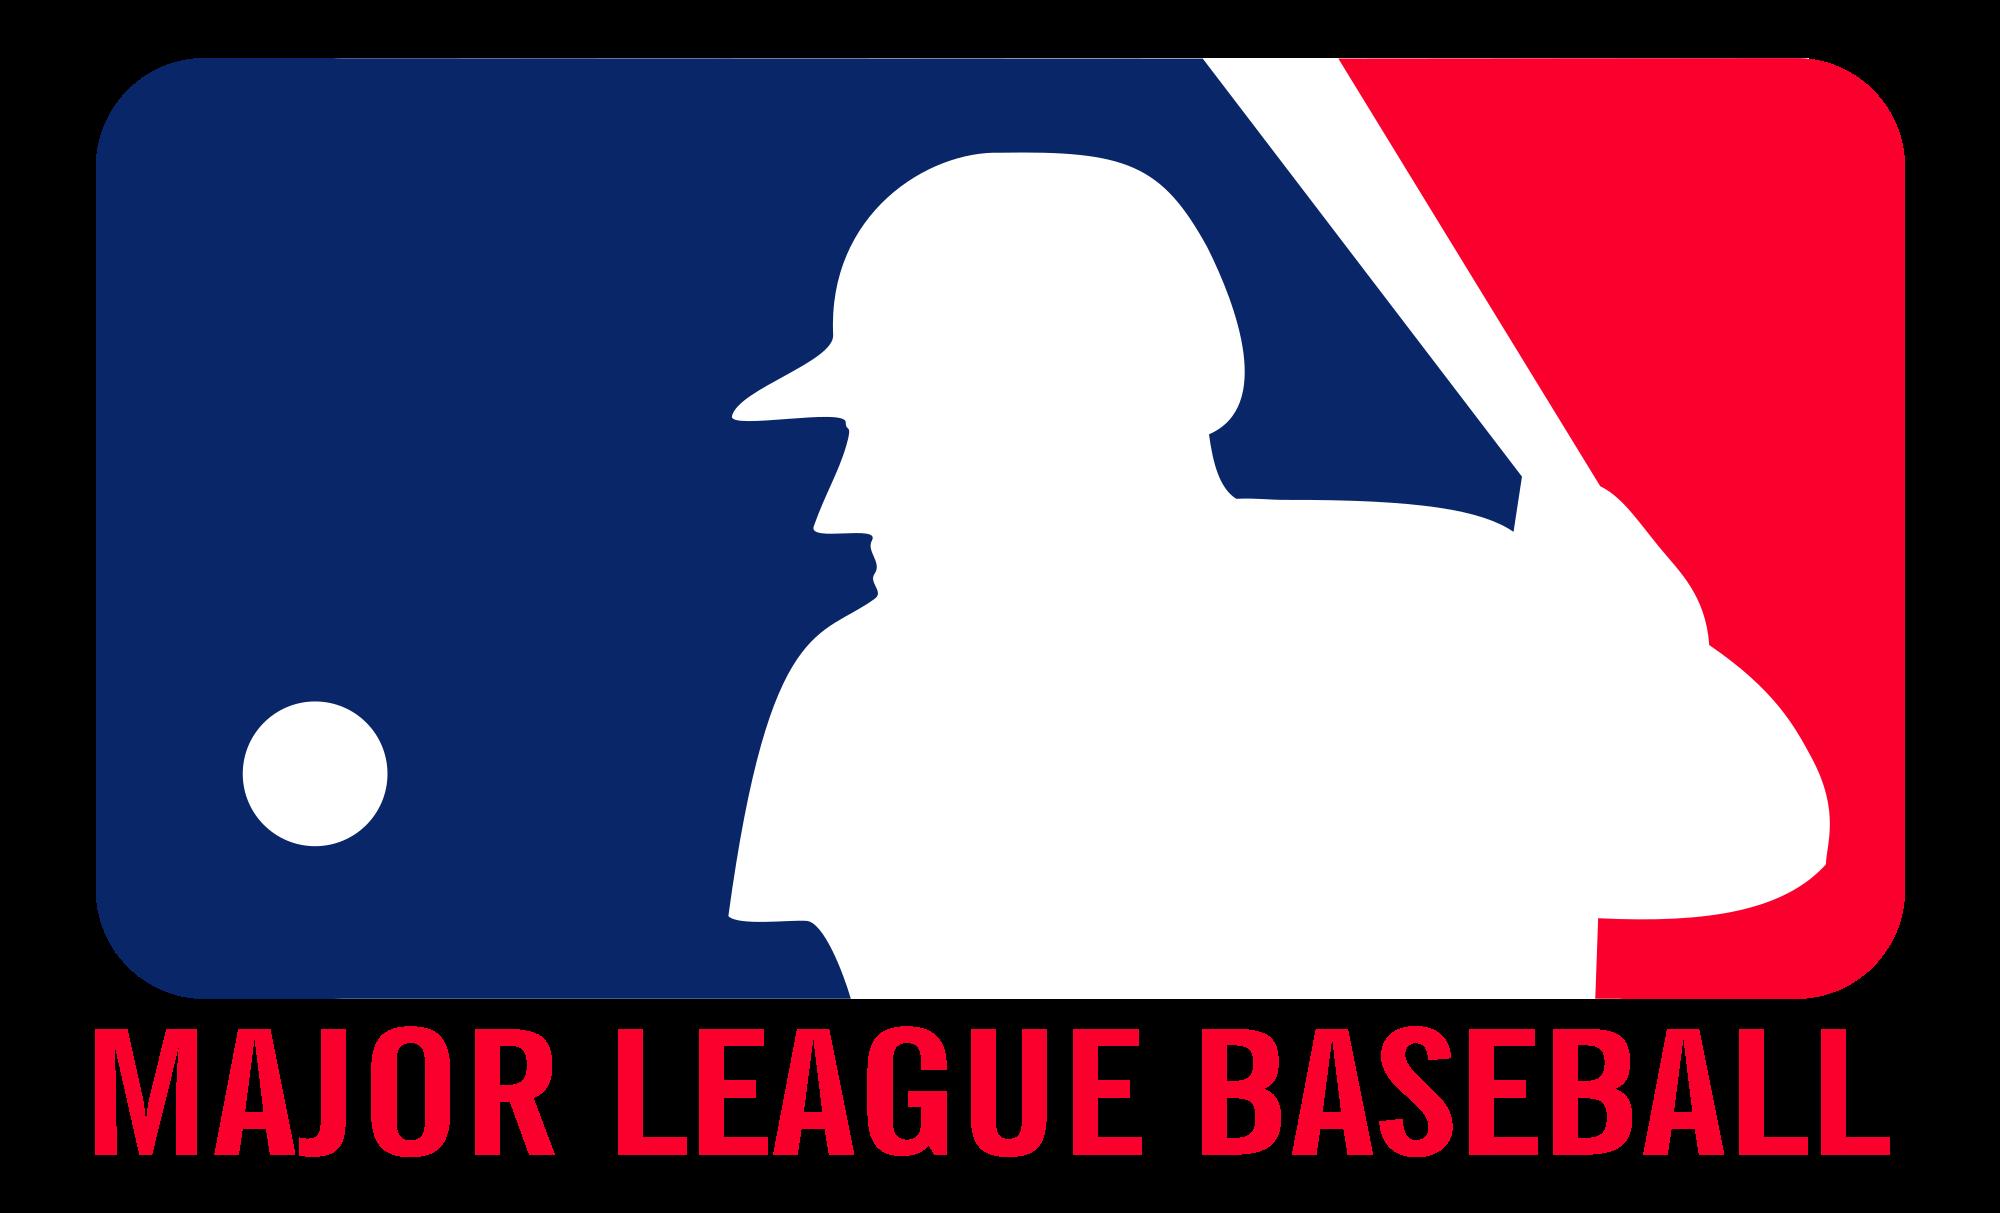 clip art royalty free library Datei major league logo. Svg baseball life